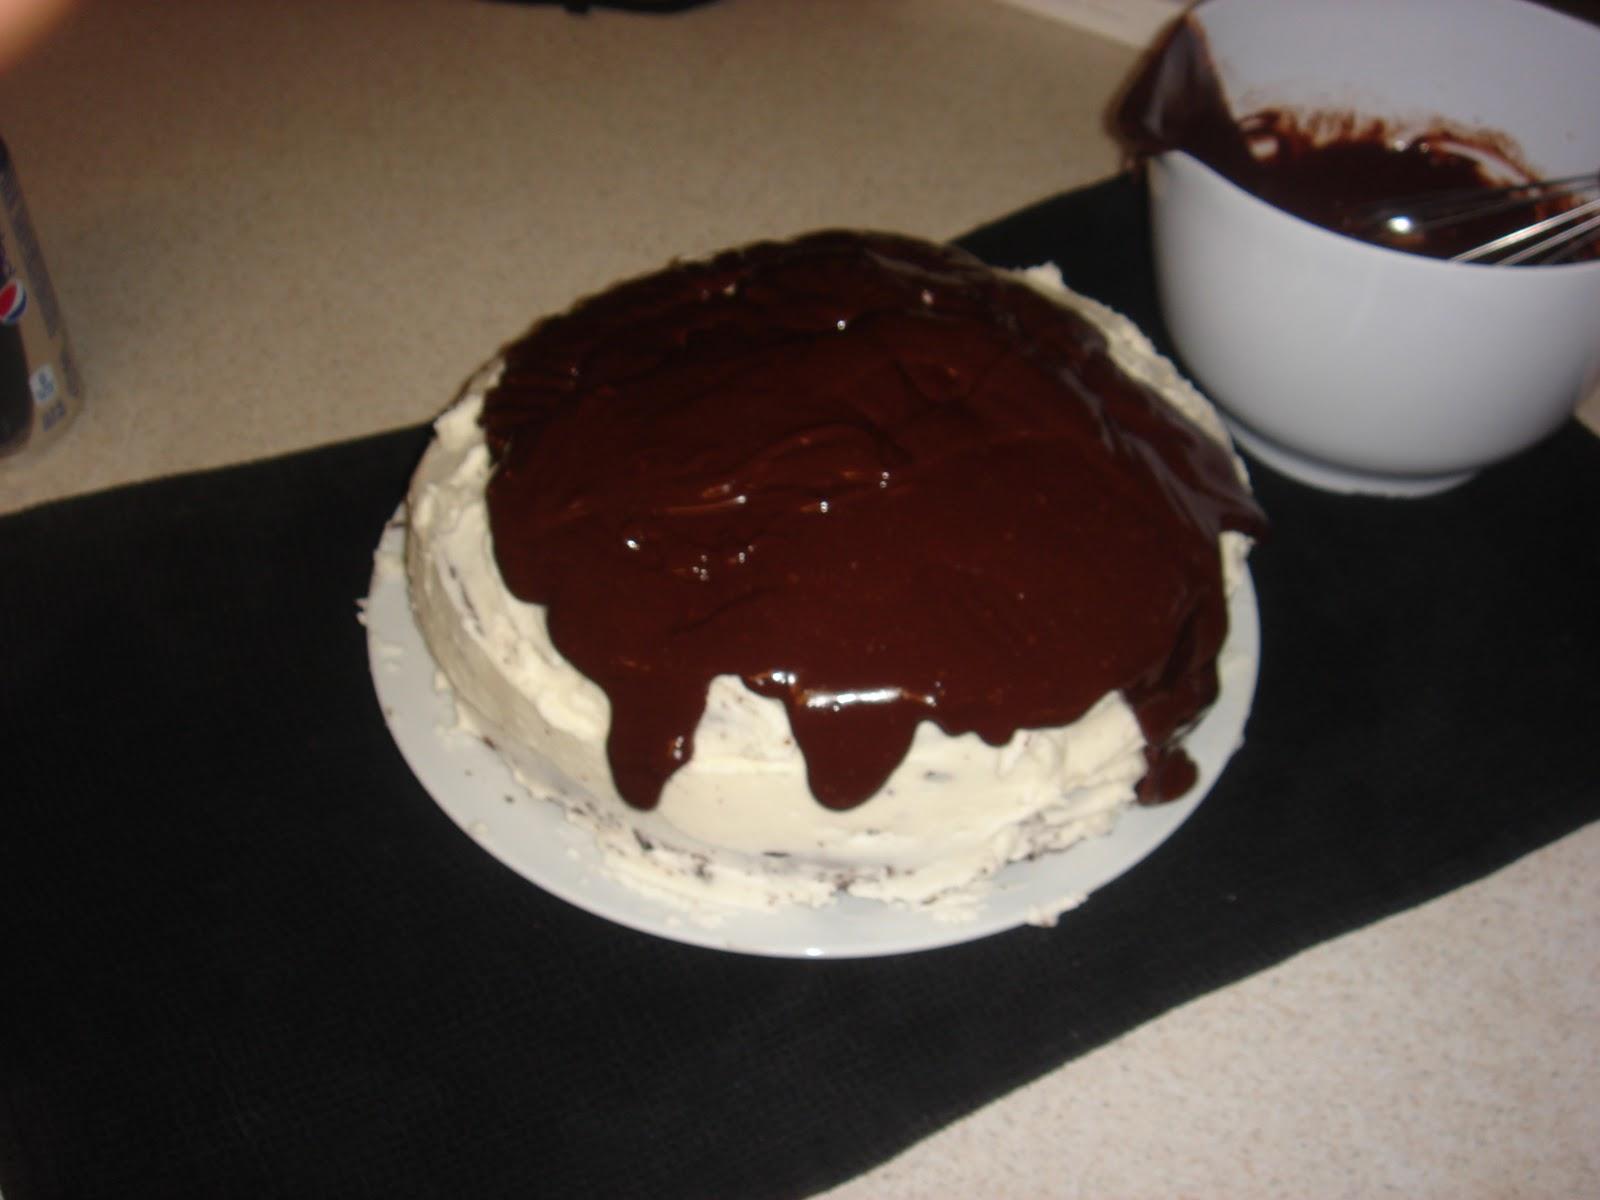 ... cake with vanilla buttercream icing and dark chocolate ganache glaze